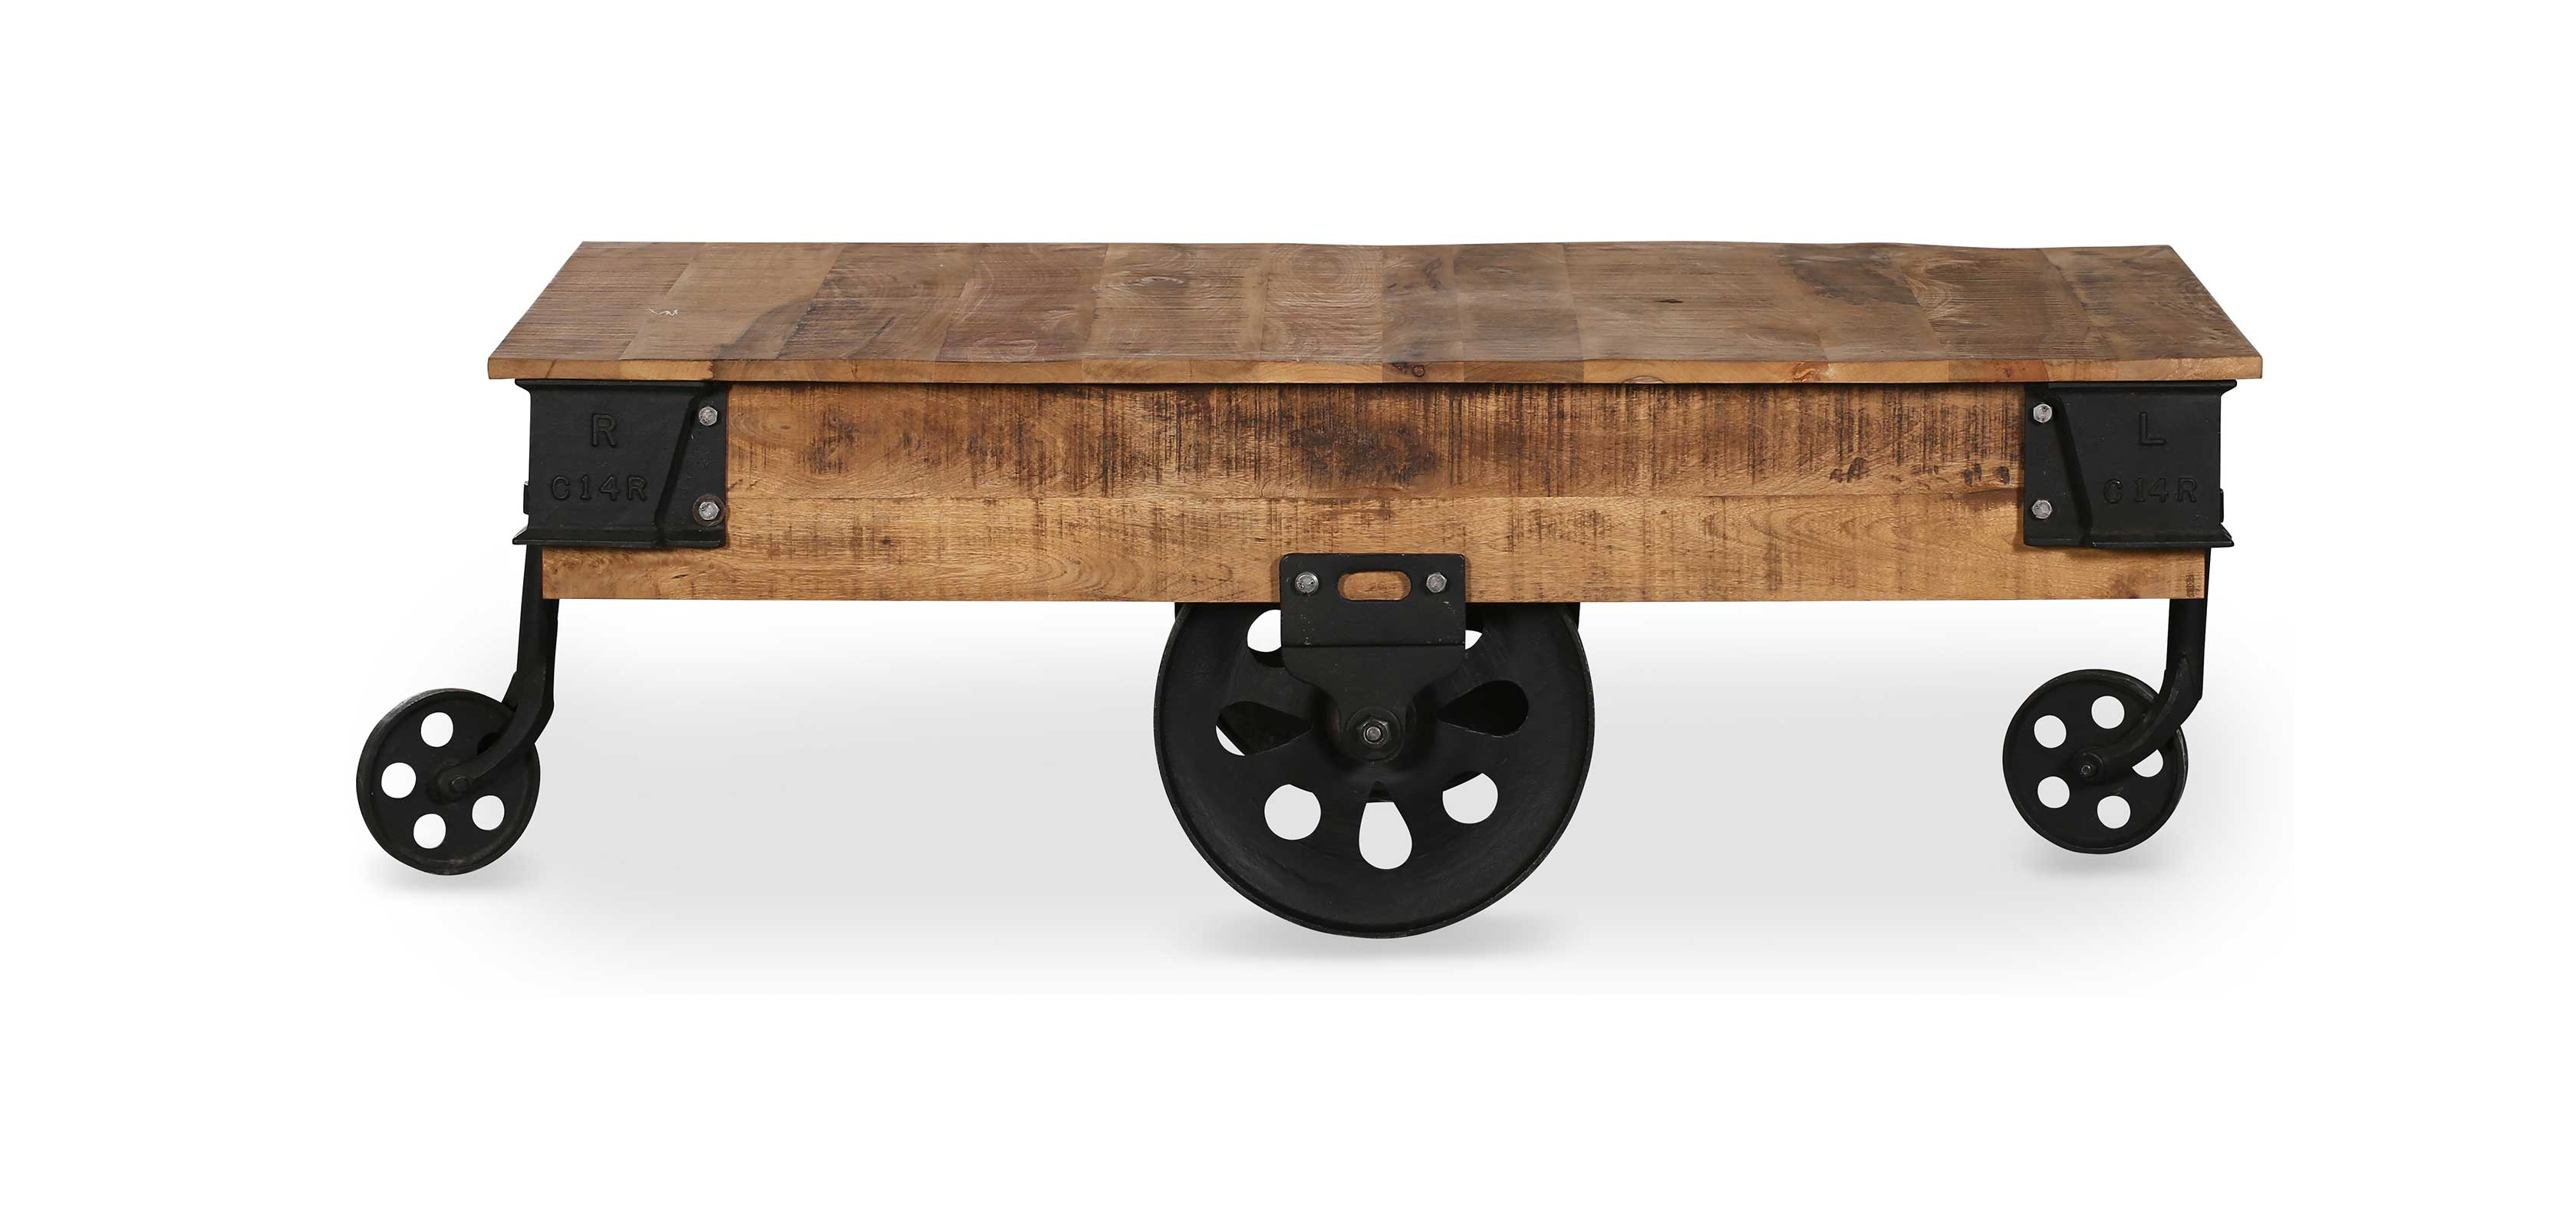 Table Basse Roulante Vintage Industrial Bois